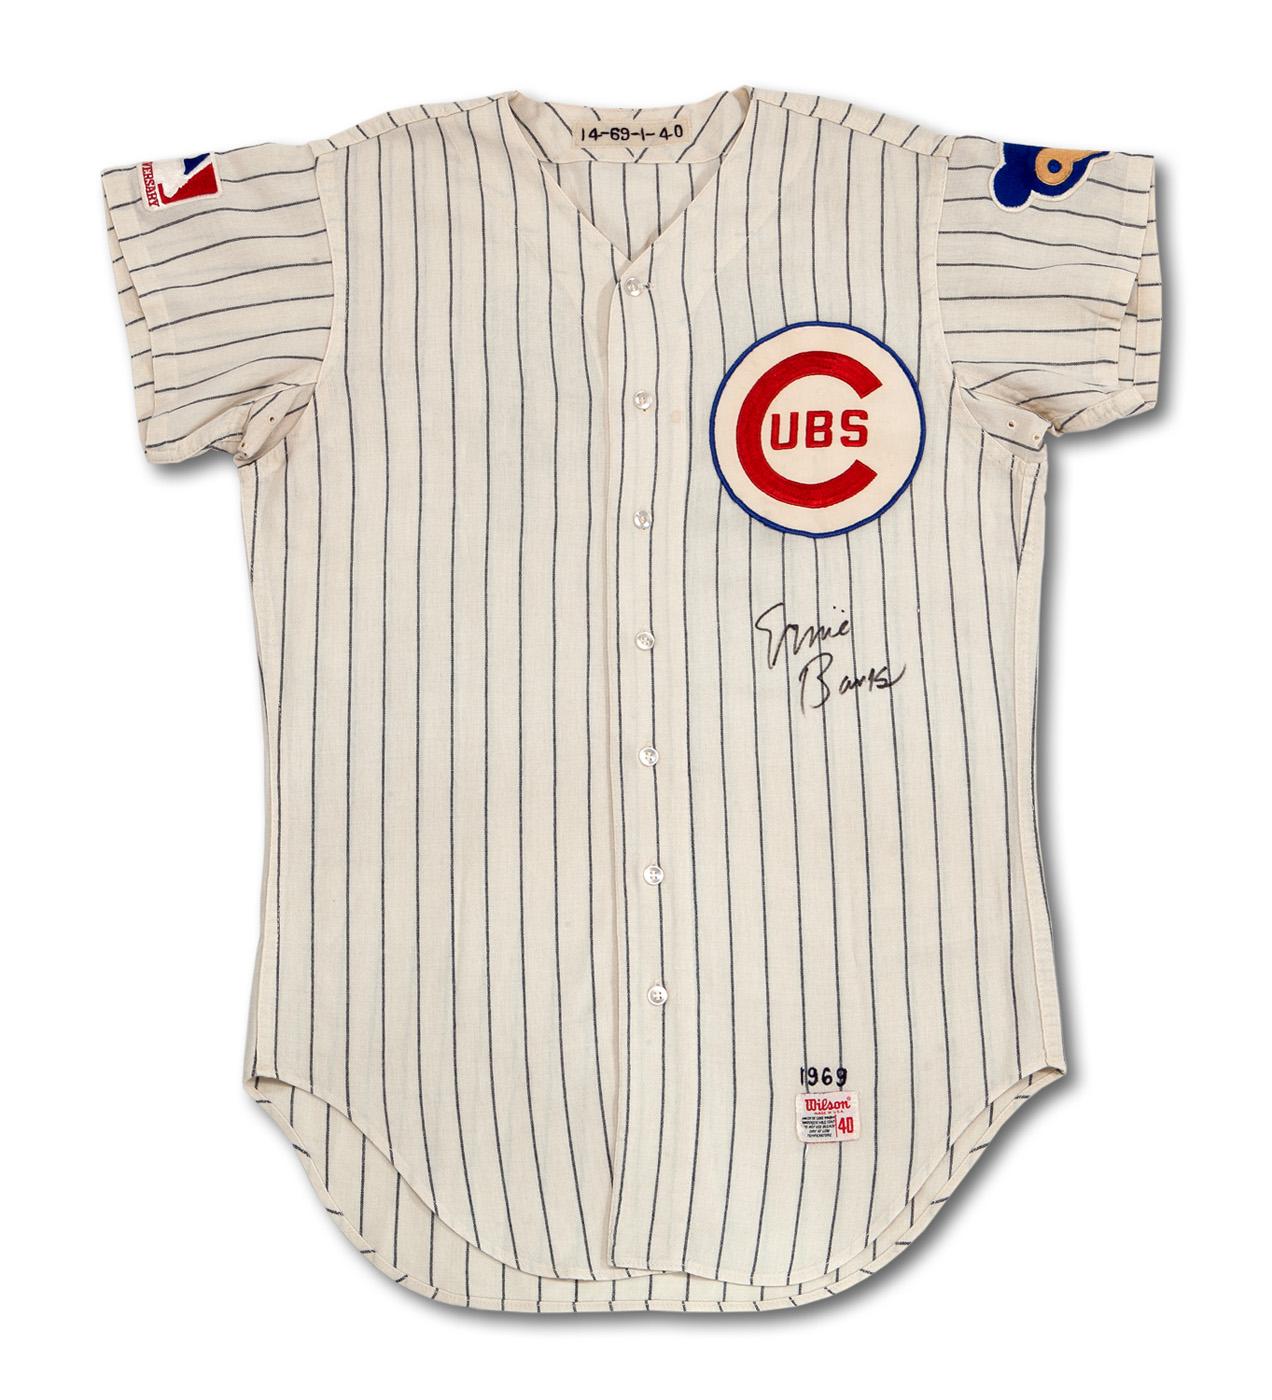 1969 Ernie Banks Cubs jersey